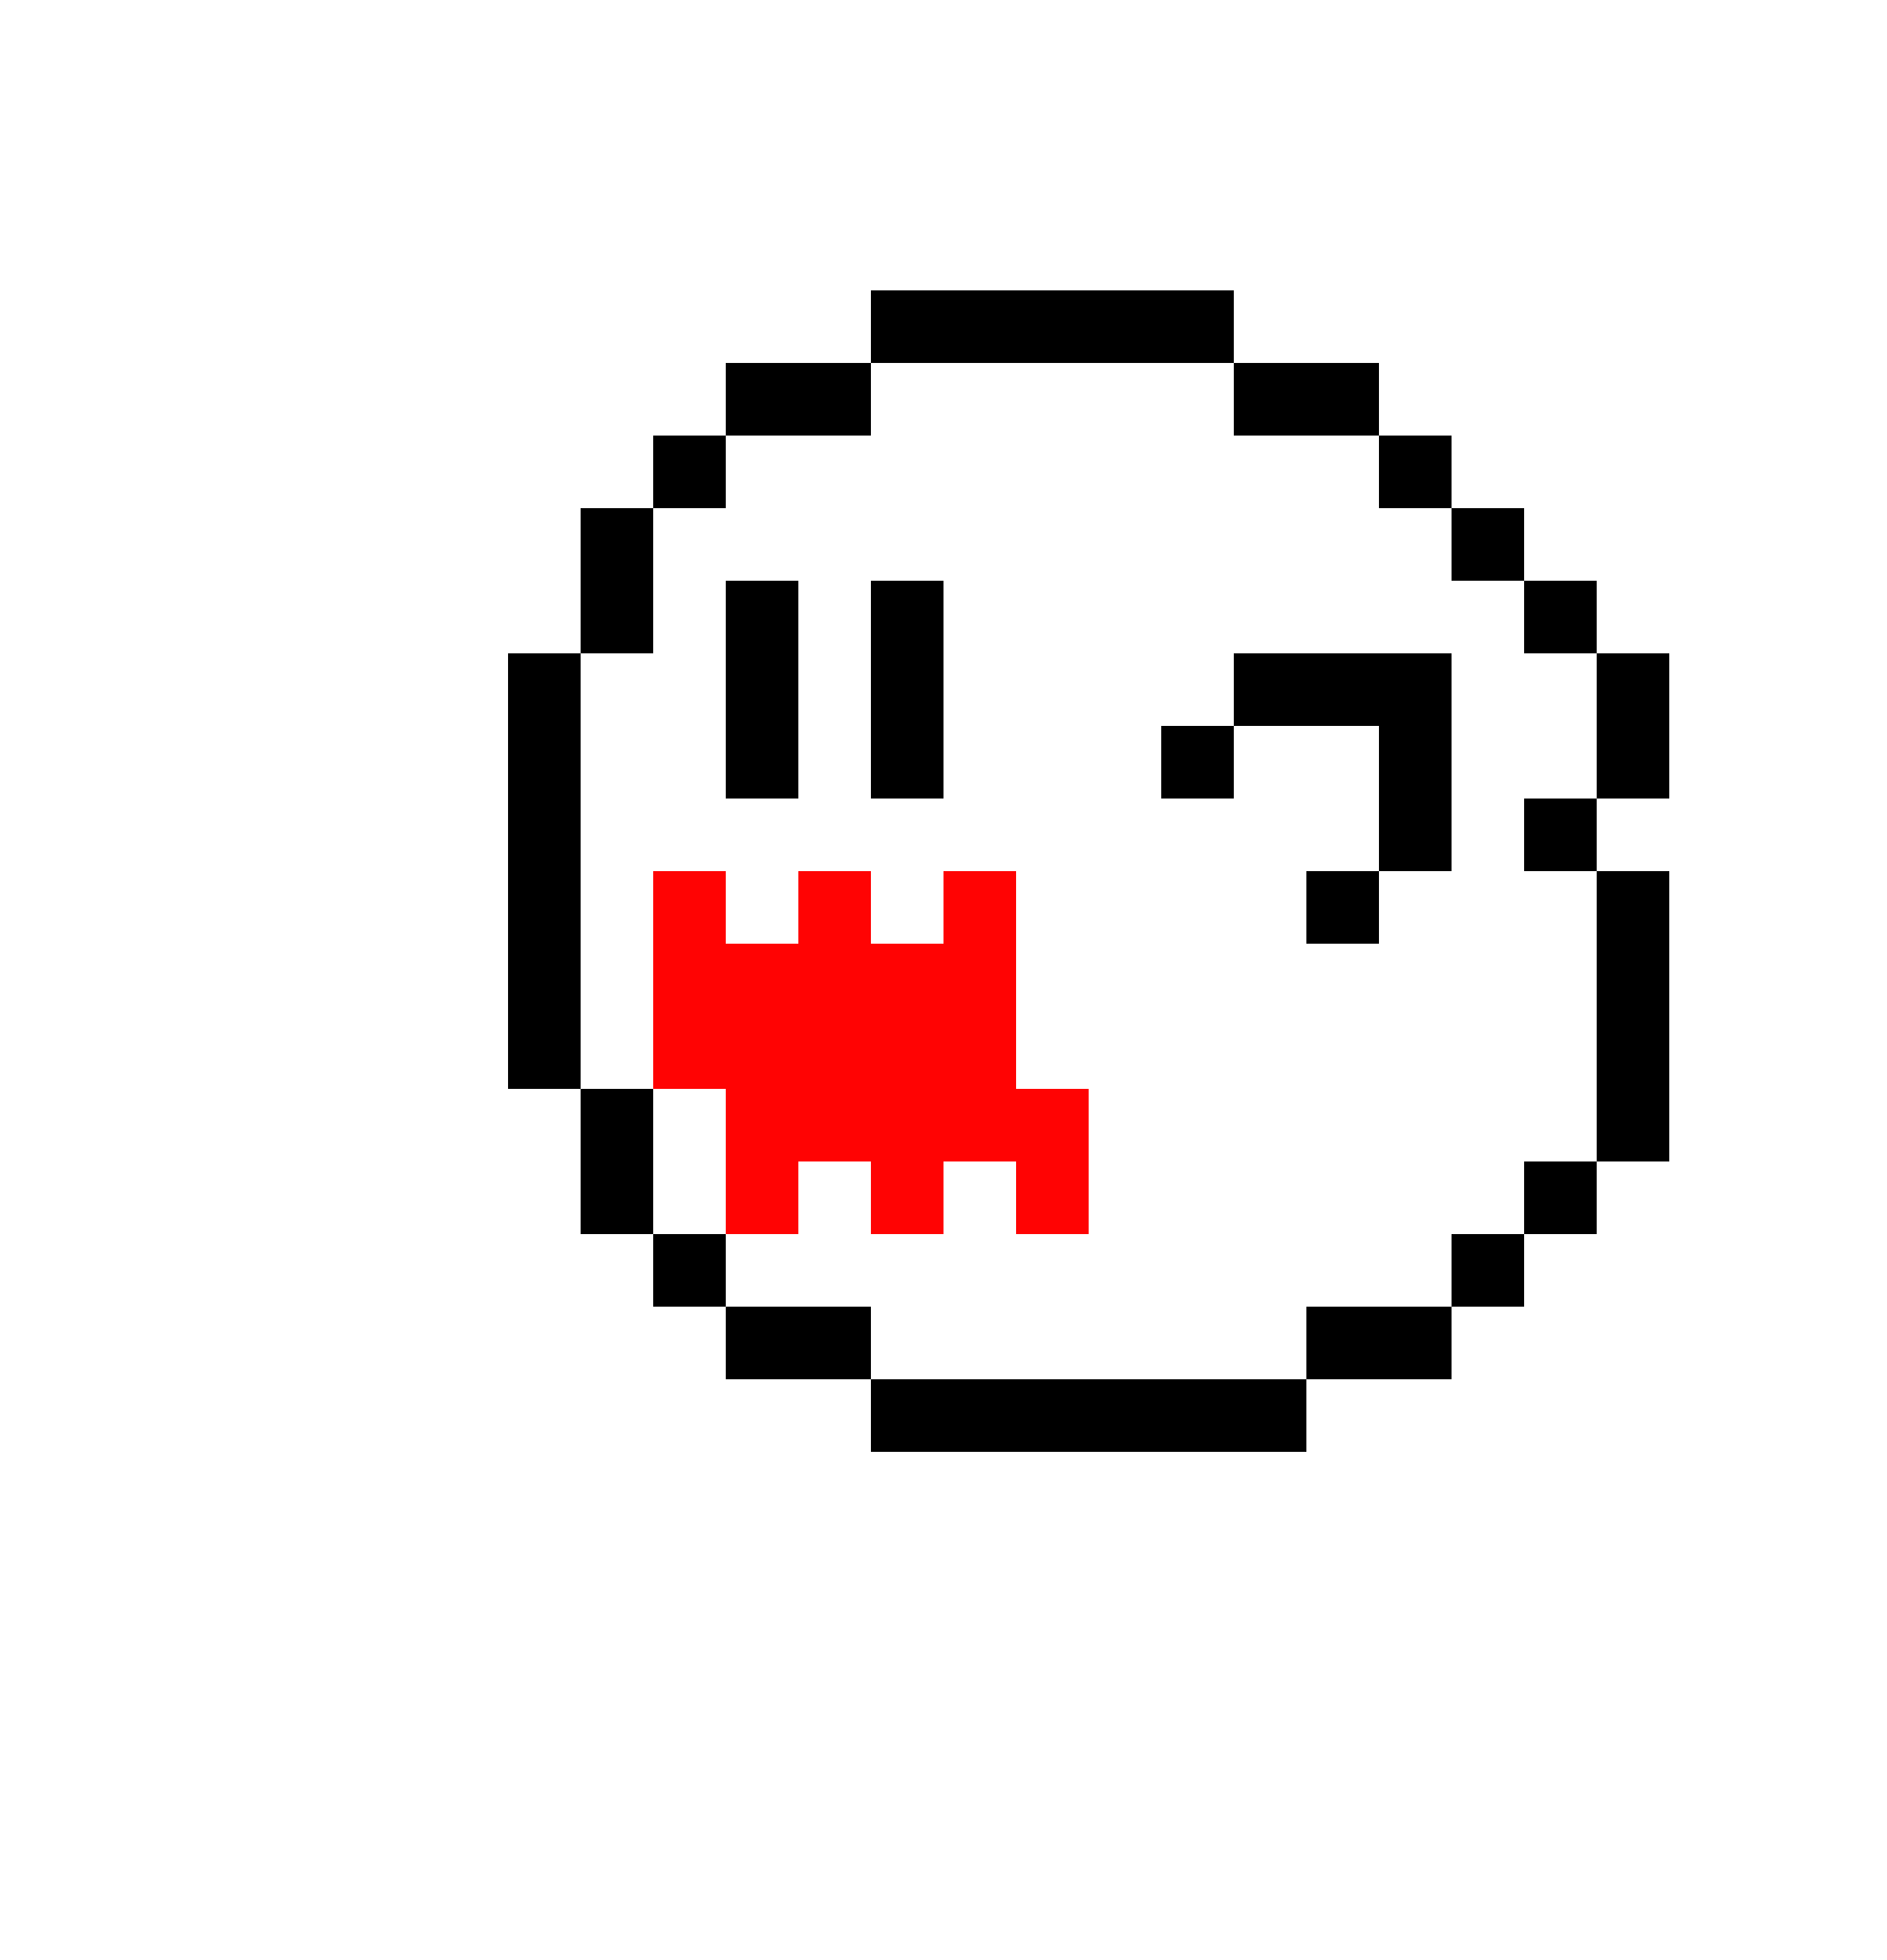 Mario Mushroom Pixel Pictures To Pin